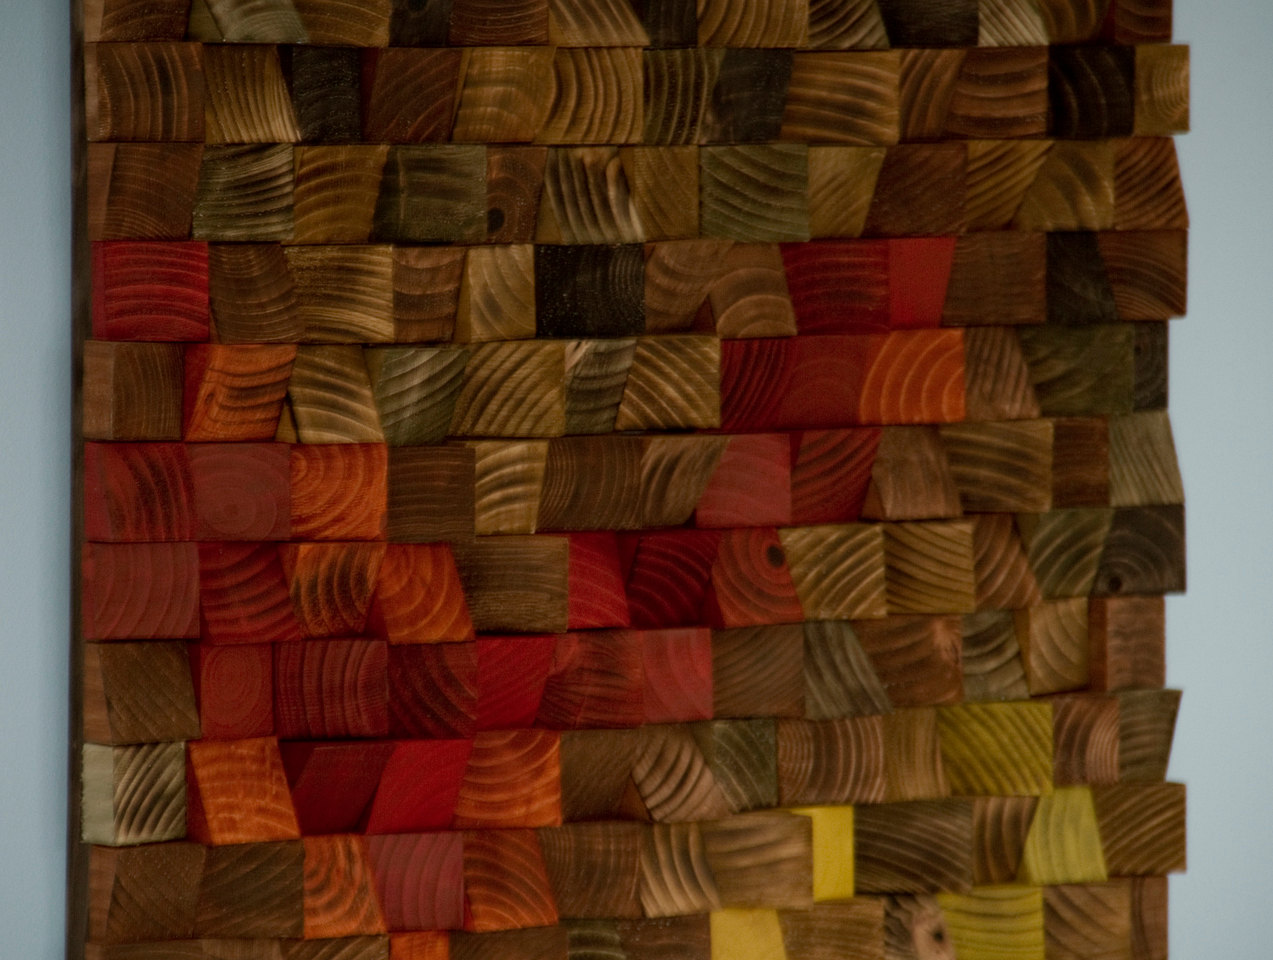 Wood Mosaic, reclaimed wood art, acrylic painting on wood